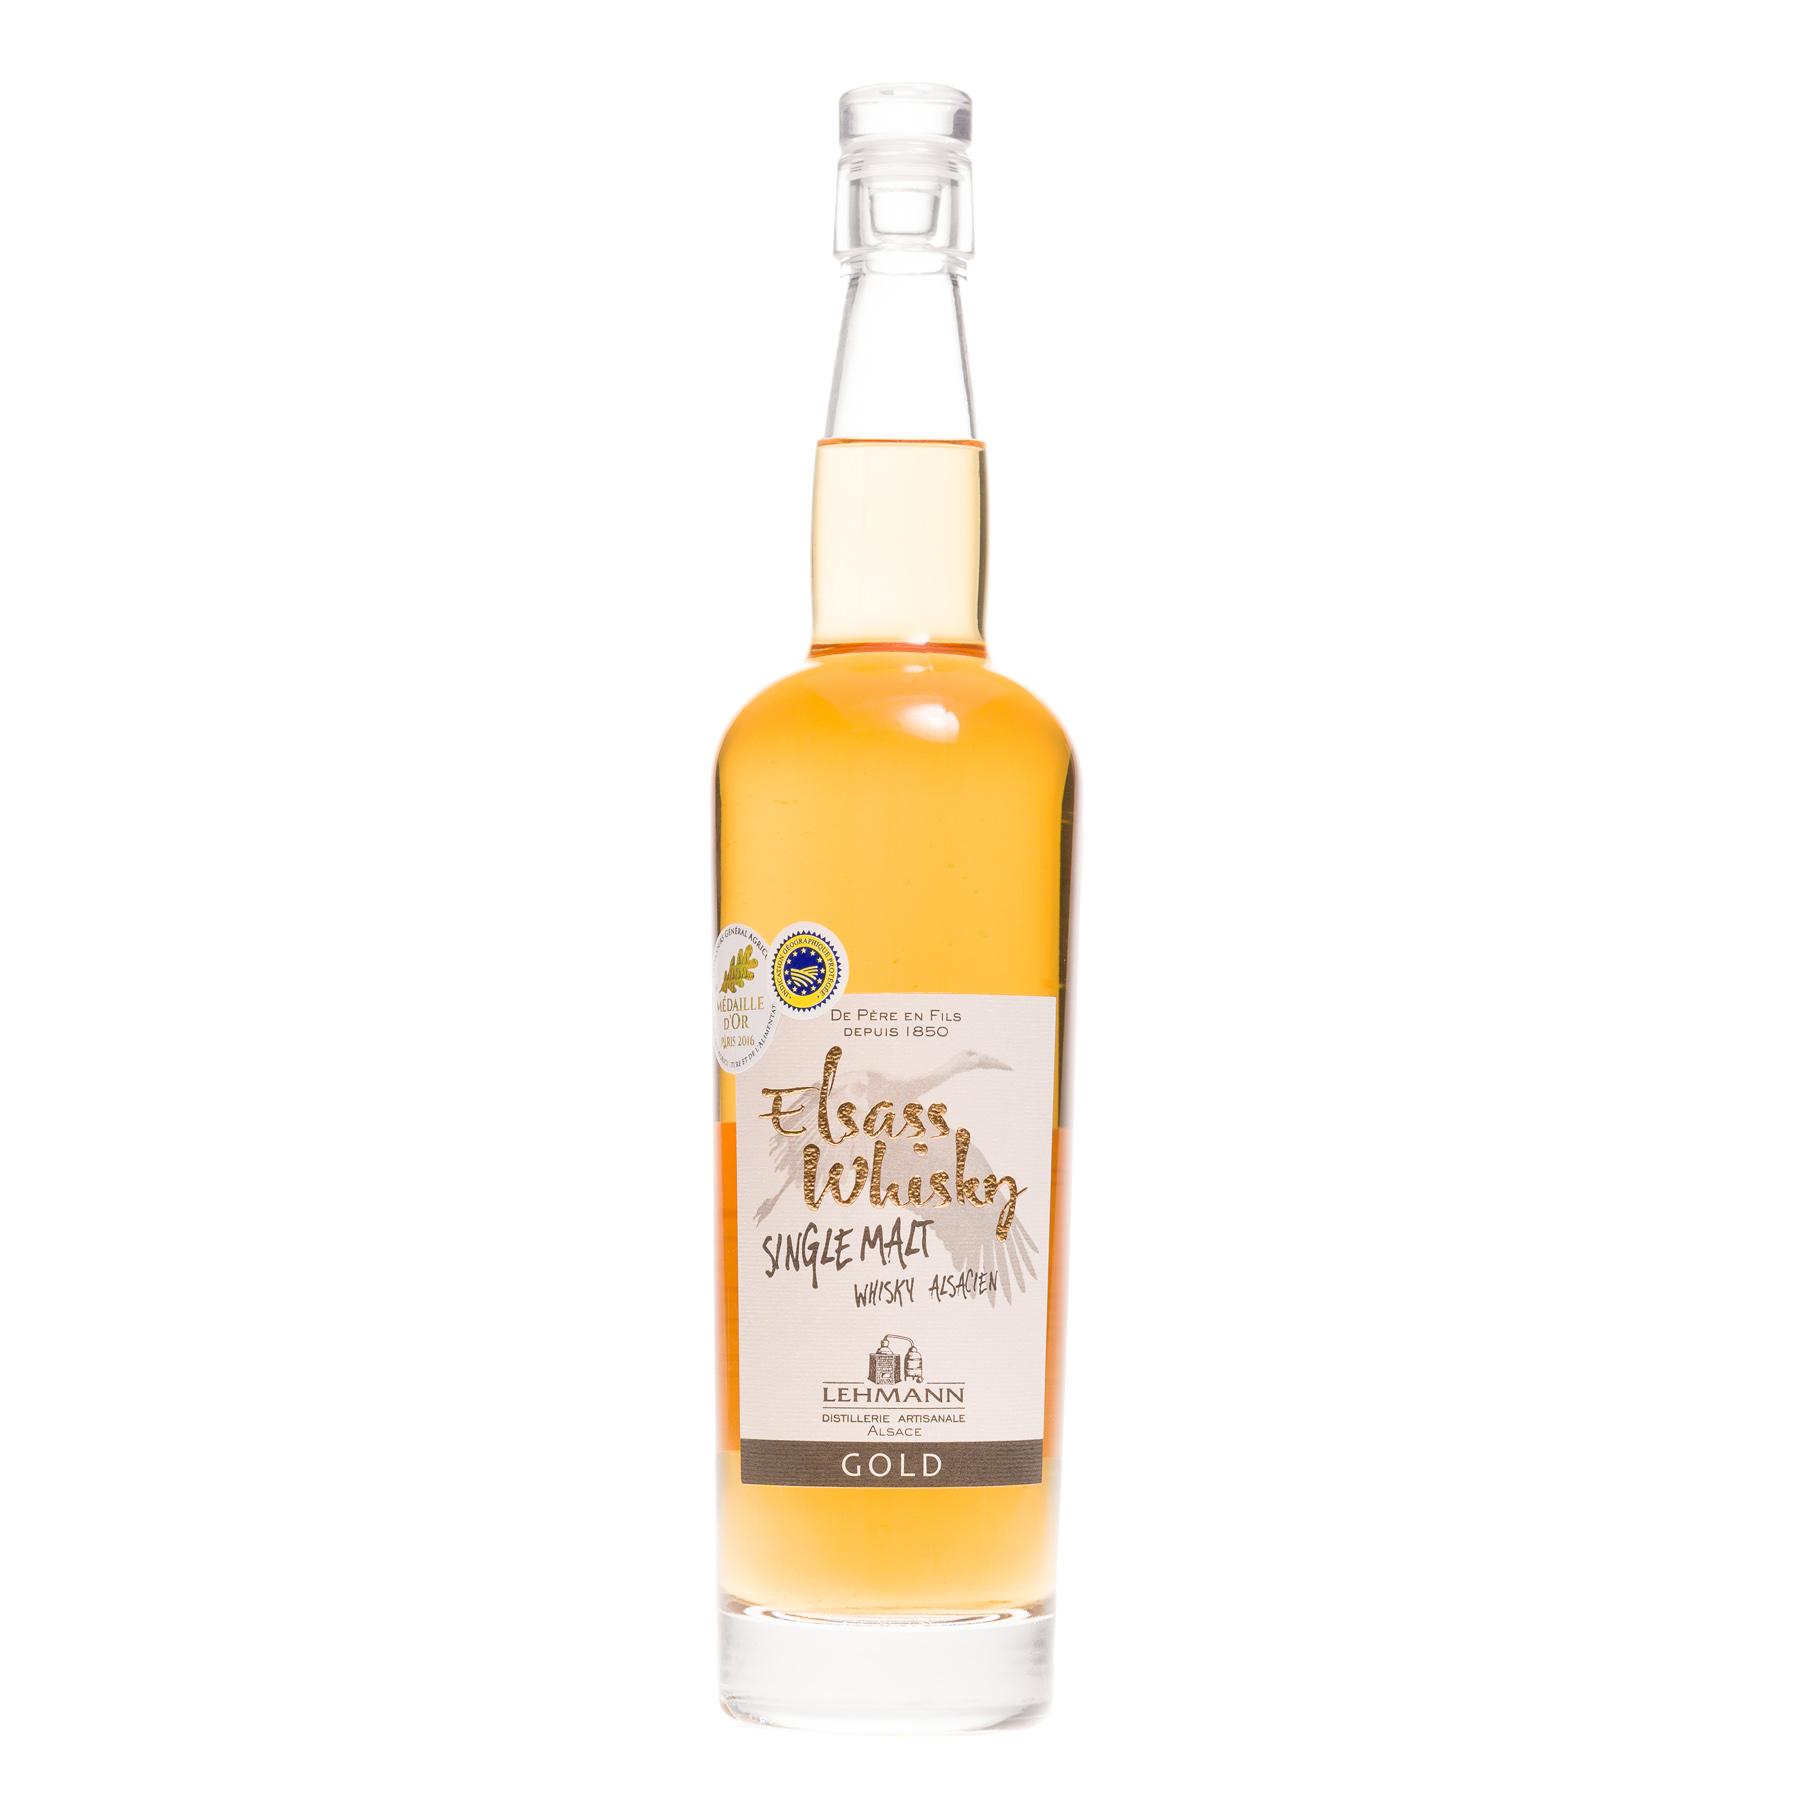 Whisky Alsacien Elsass Gold single malt 40°